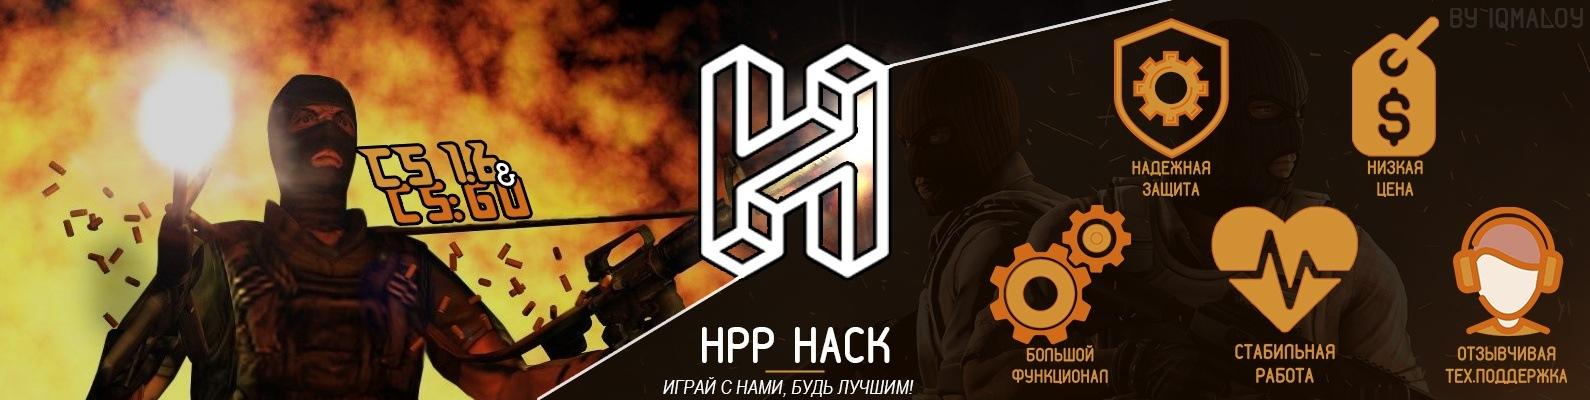 hpp hack 3.5 cs 1.6